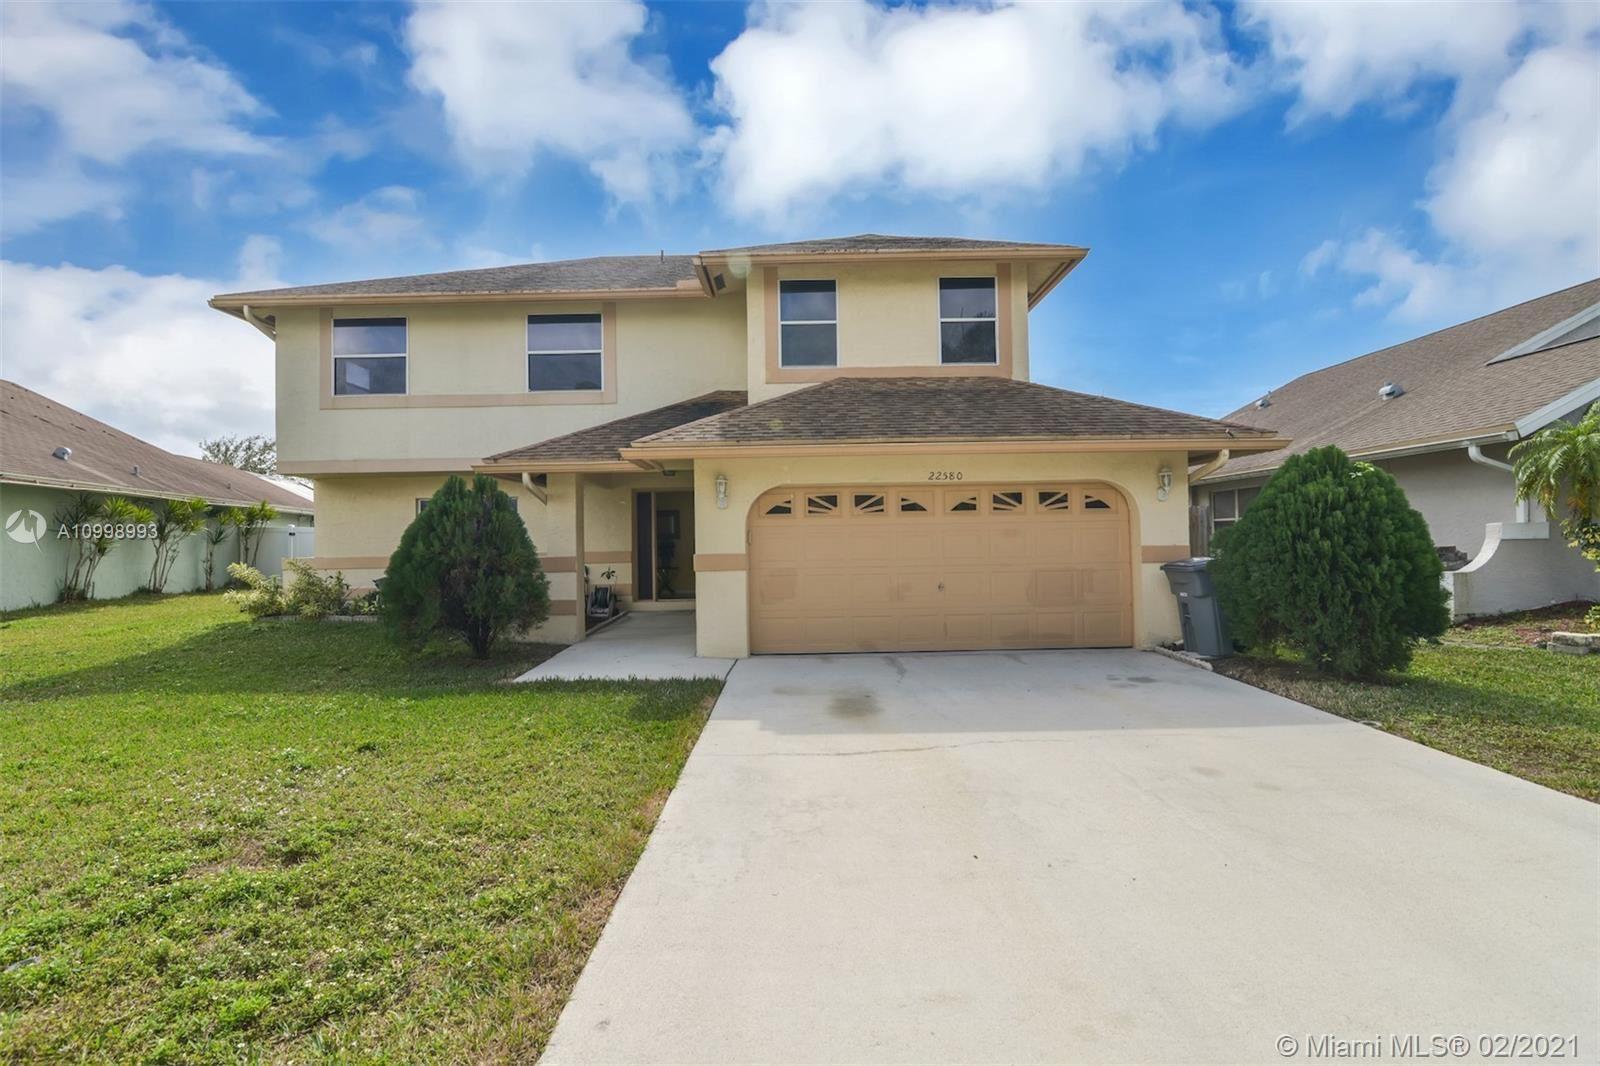 22580 Blue Fin Trl, Boca Raton, FL 33428 - #: A10998993